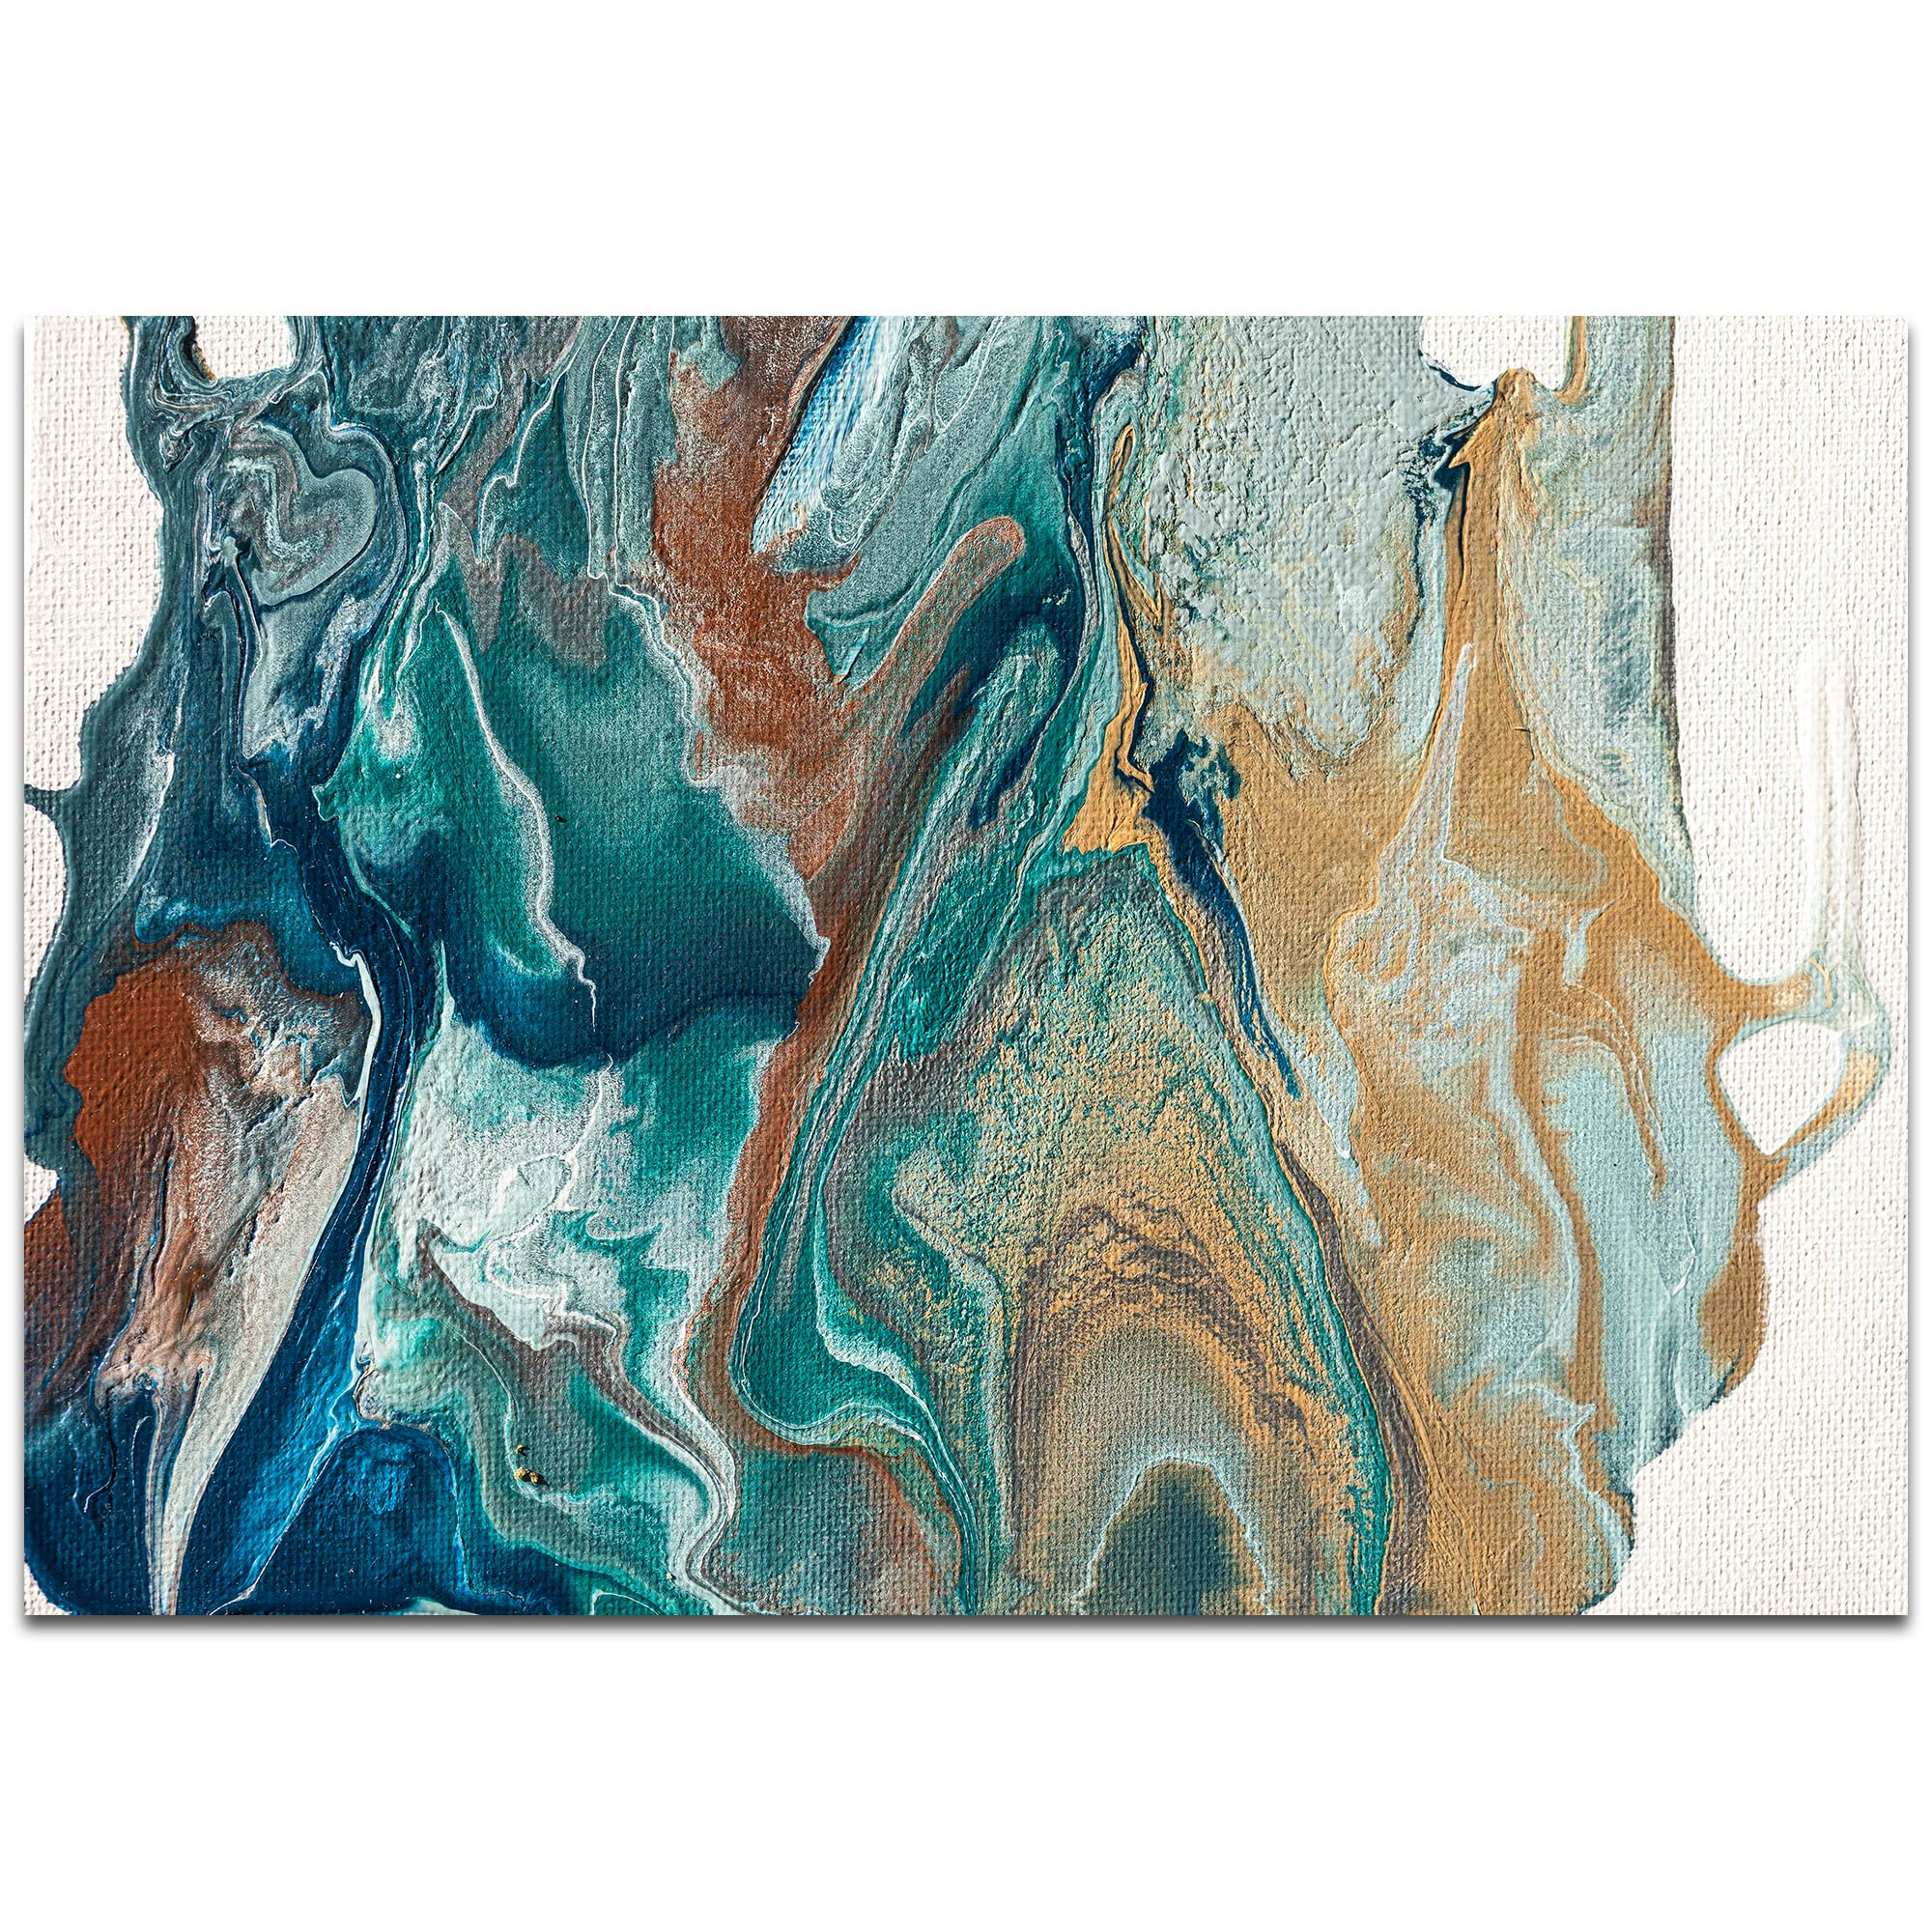 Abstract Wall Art 'Earth 2' - Urban Splatter Decor on Metal or Plexiglass